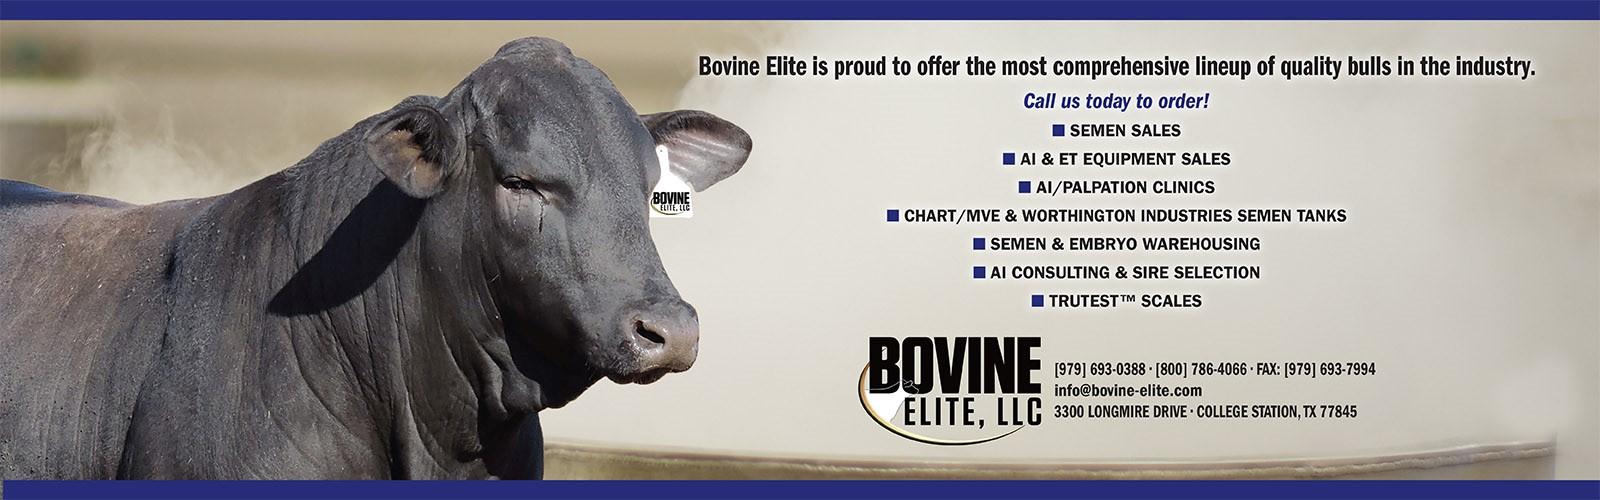 Bovine Elite, LLC